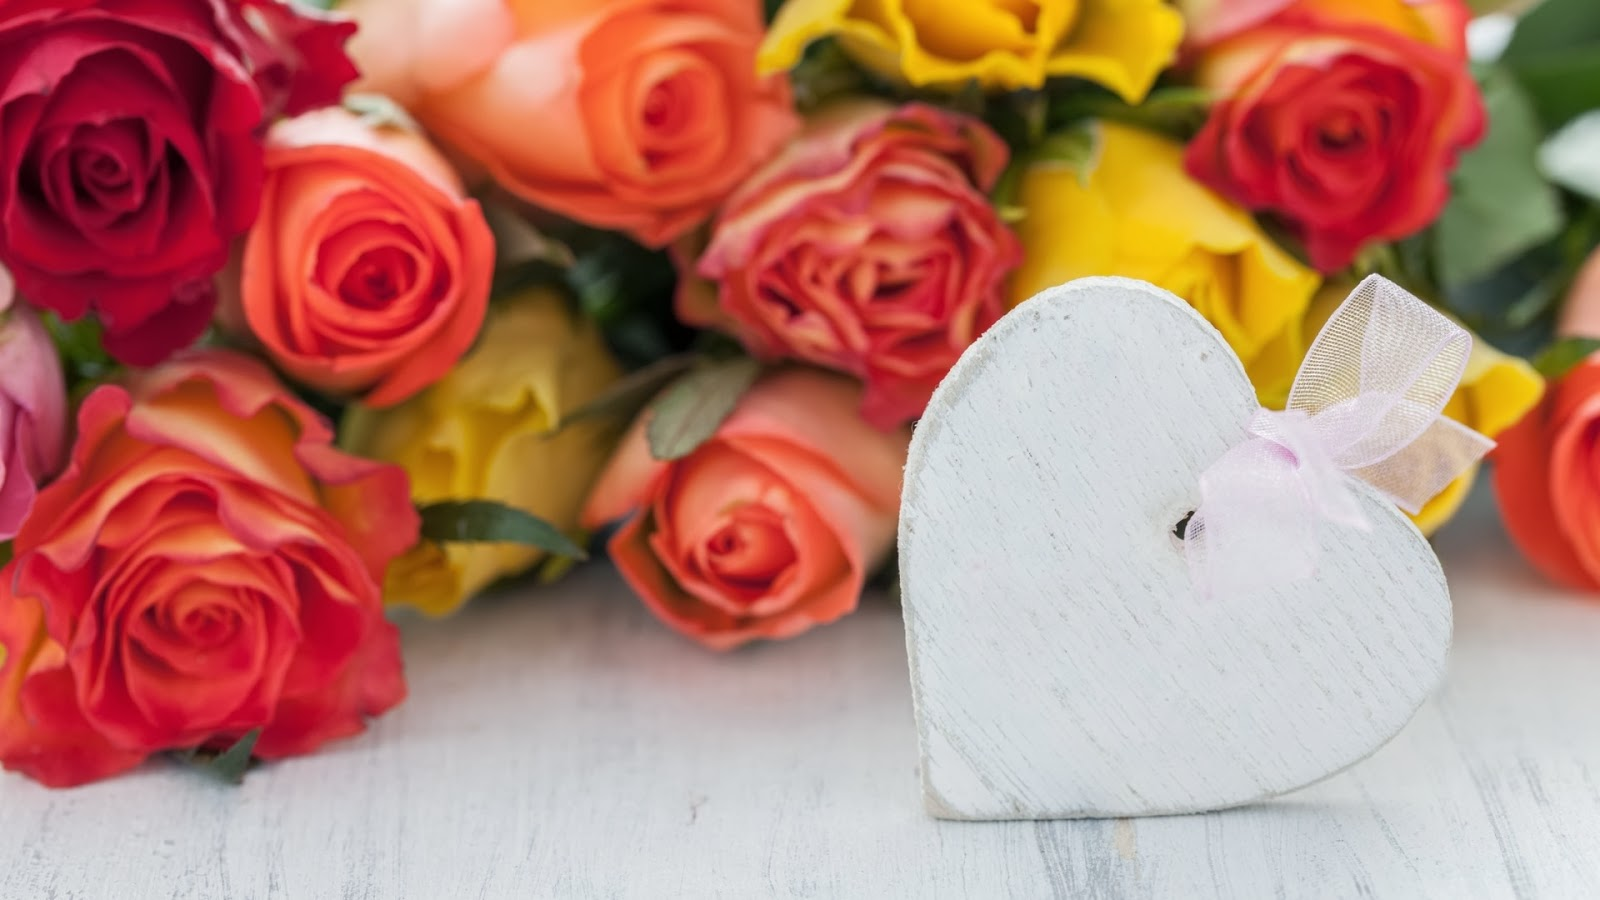 Imagen de Ramos de Flores para San Valentín